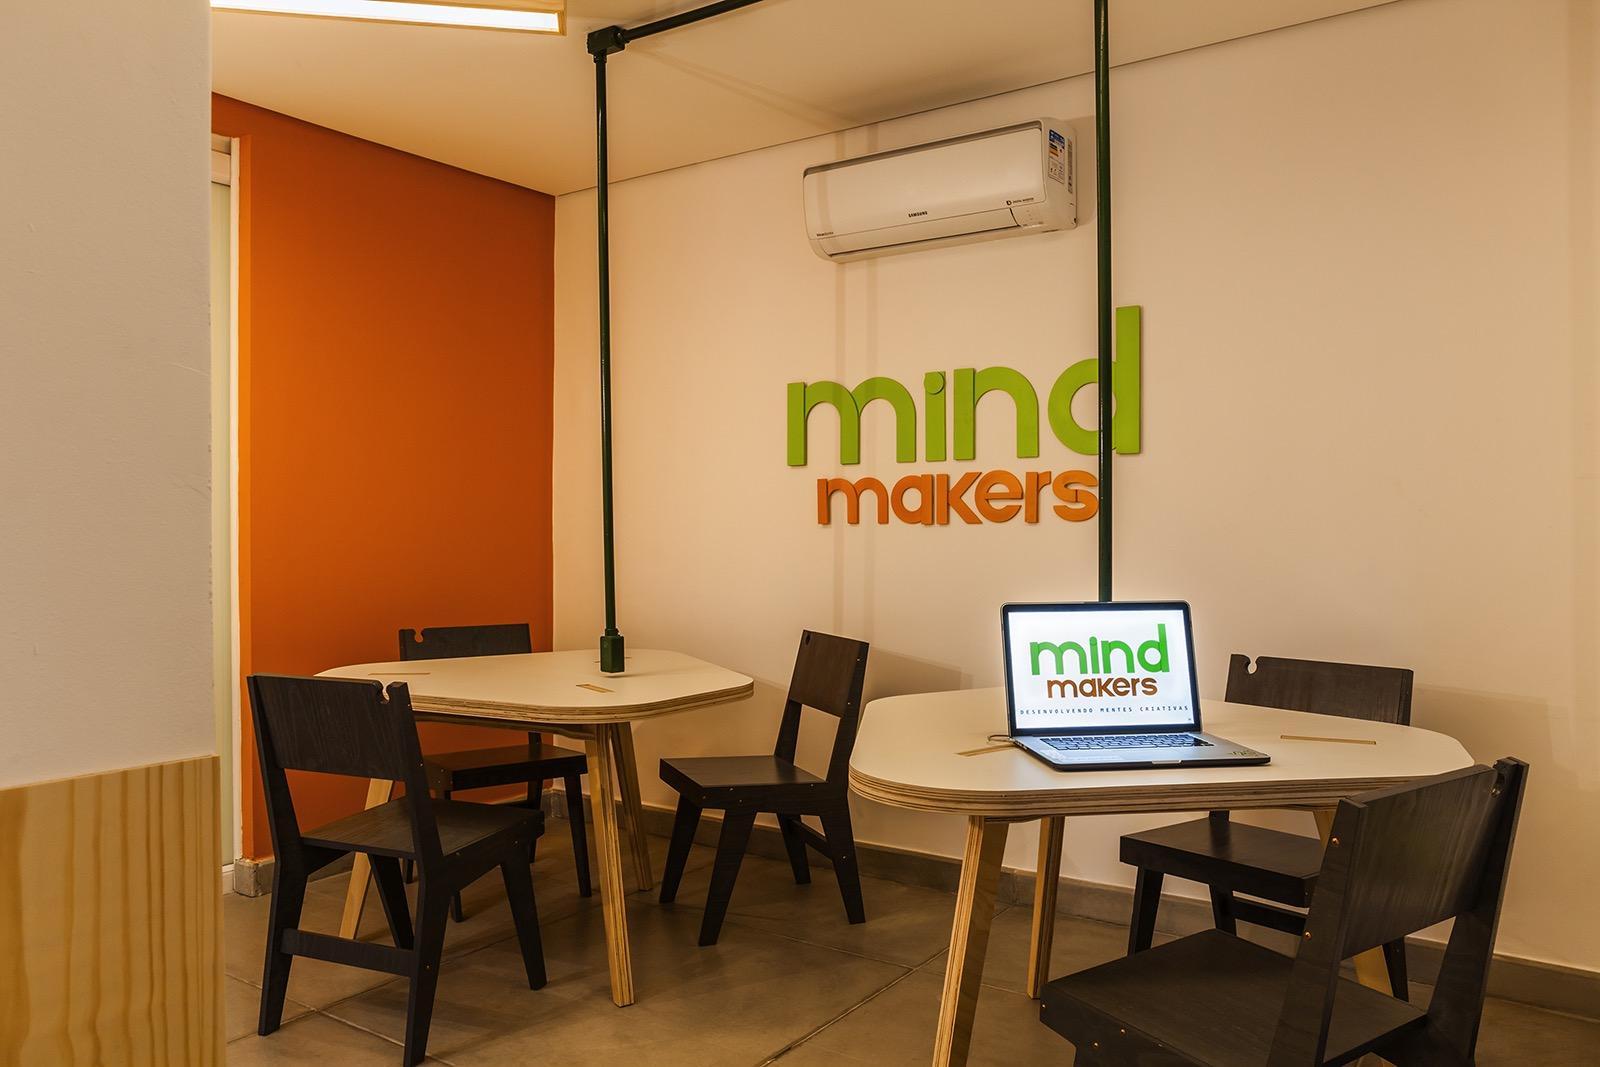 mind-makers-sao-paulo-7